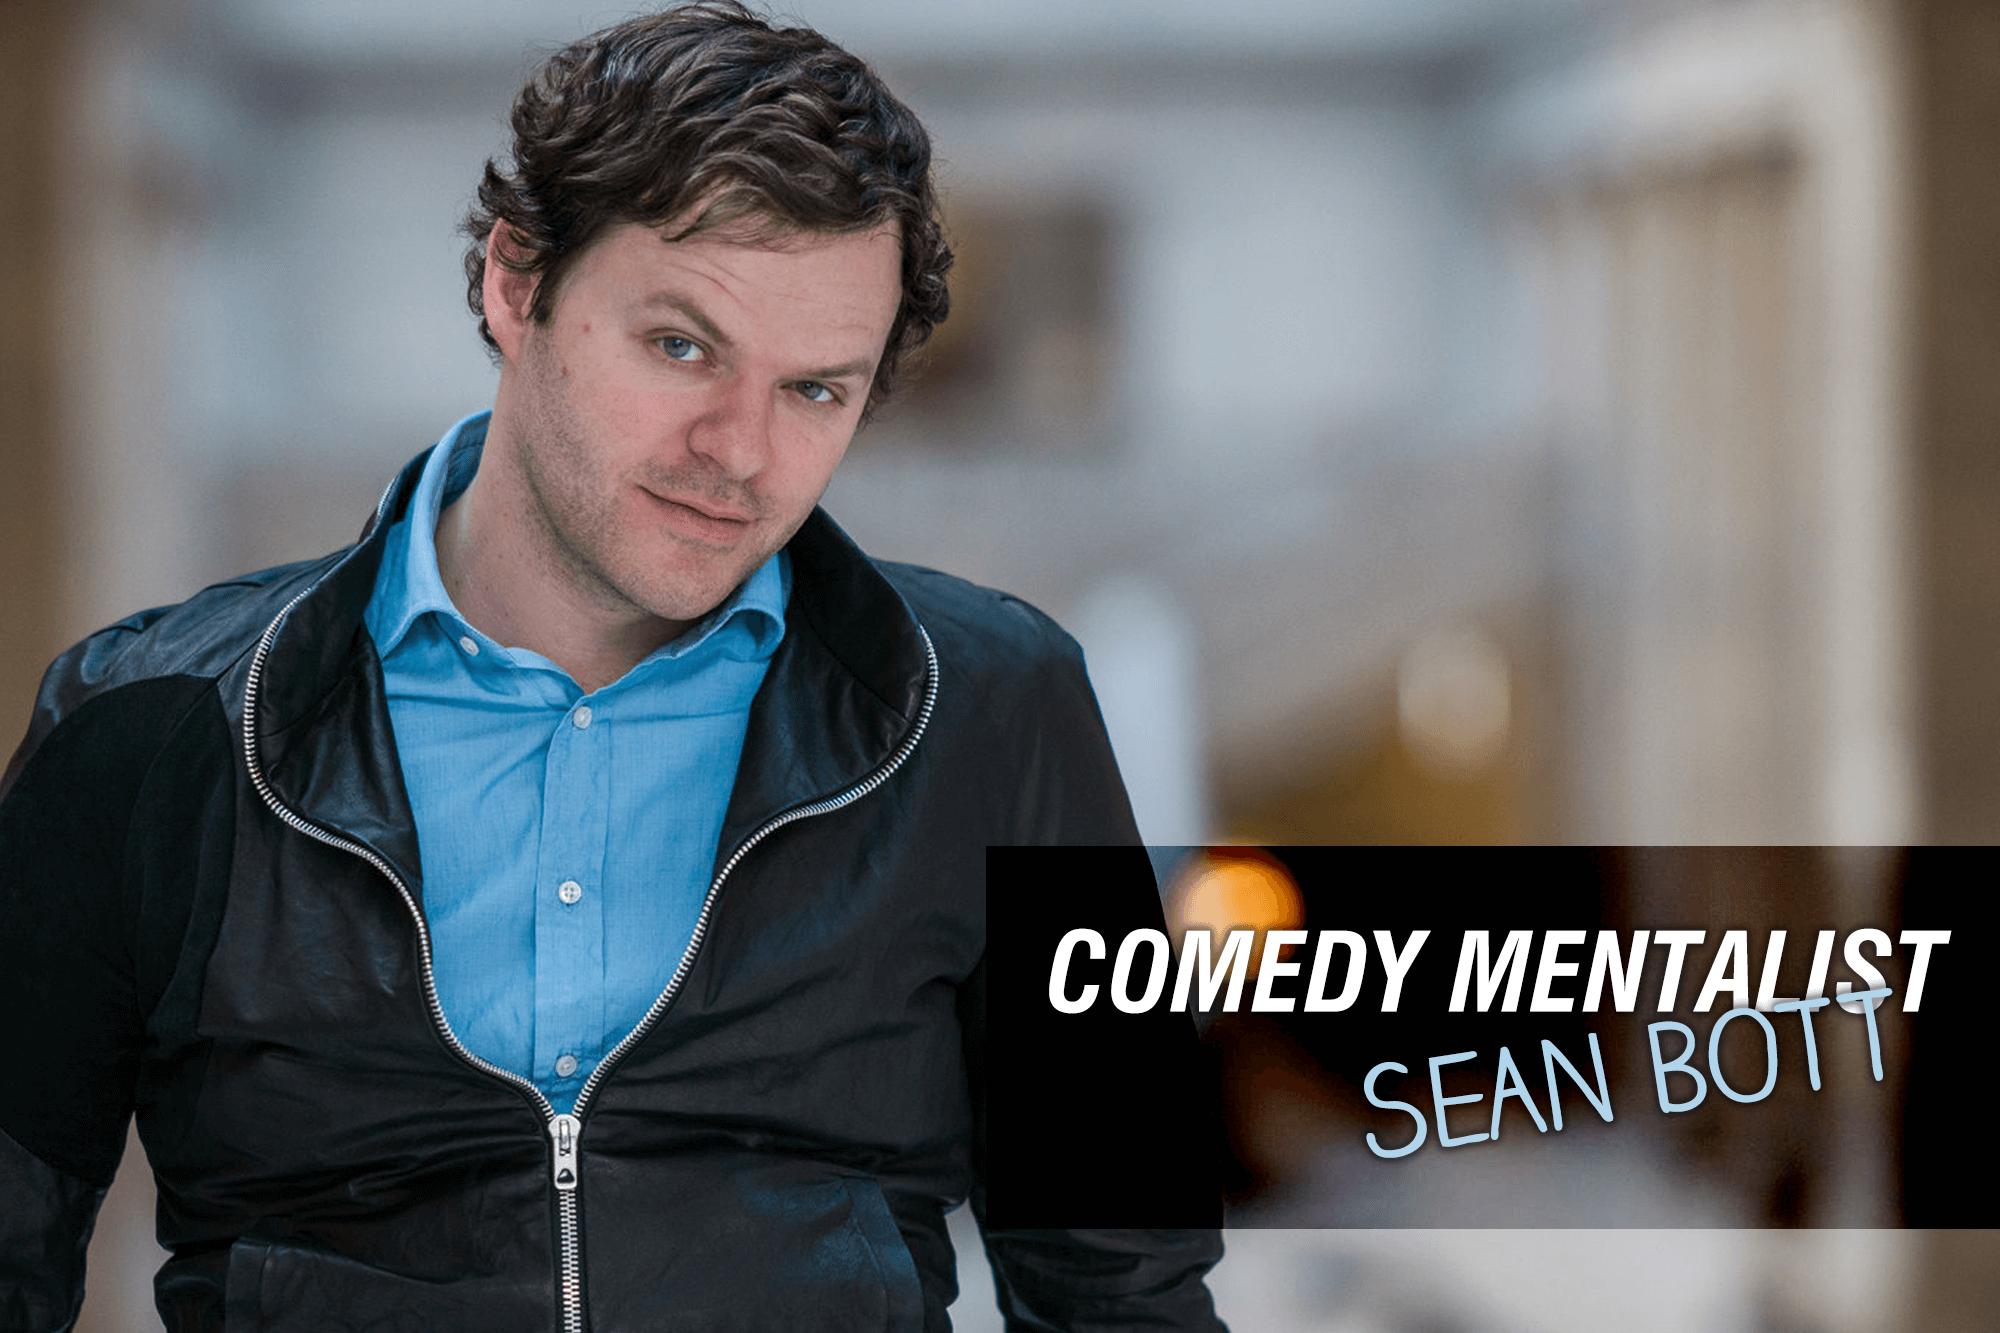 Photo of Sean Bott with the words Comedy Mentalist Sean Bott